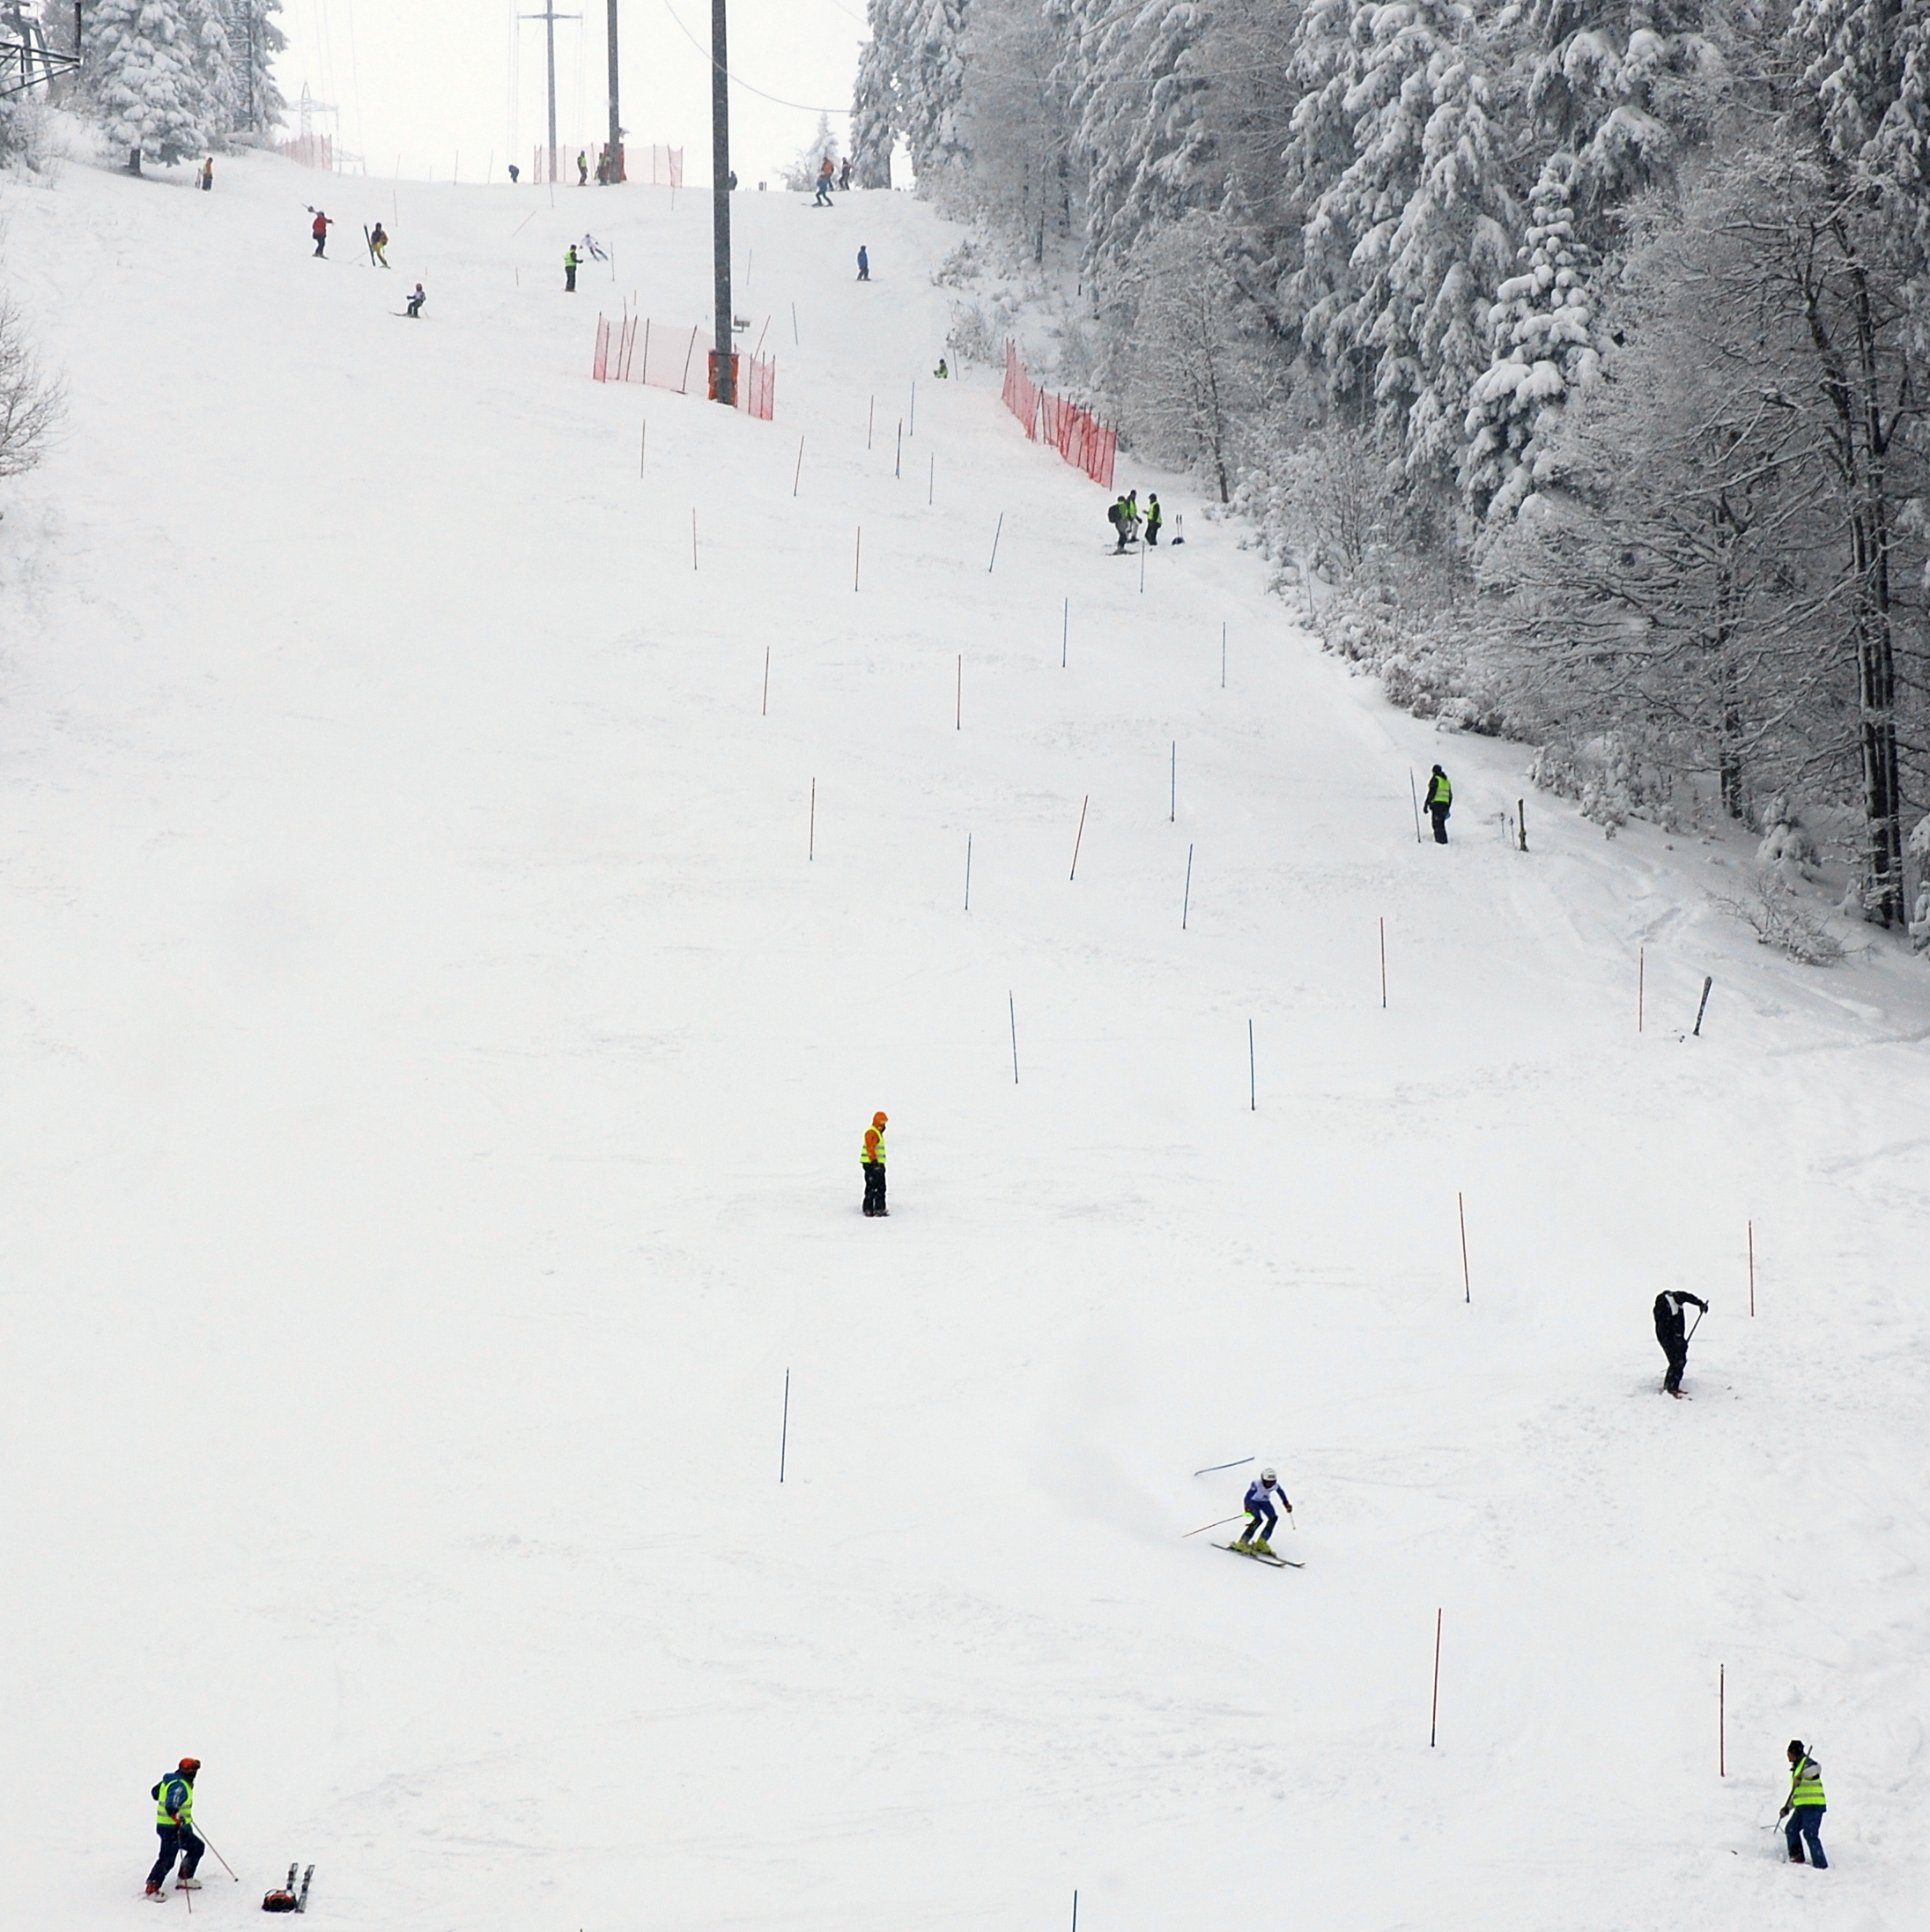 Championnats Jurassiens de Slalom à La Corbatière